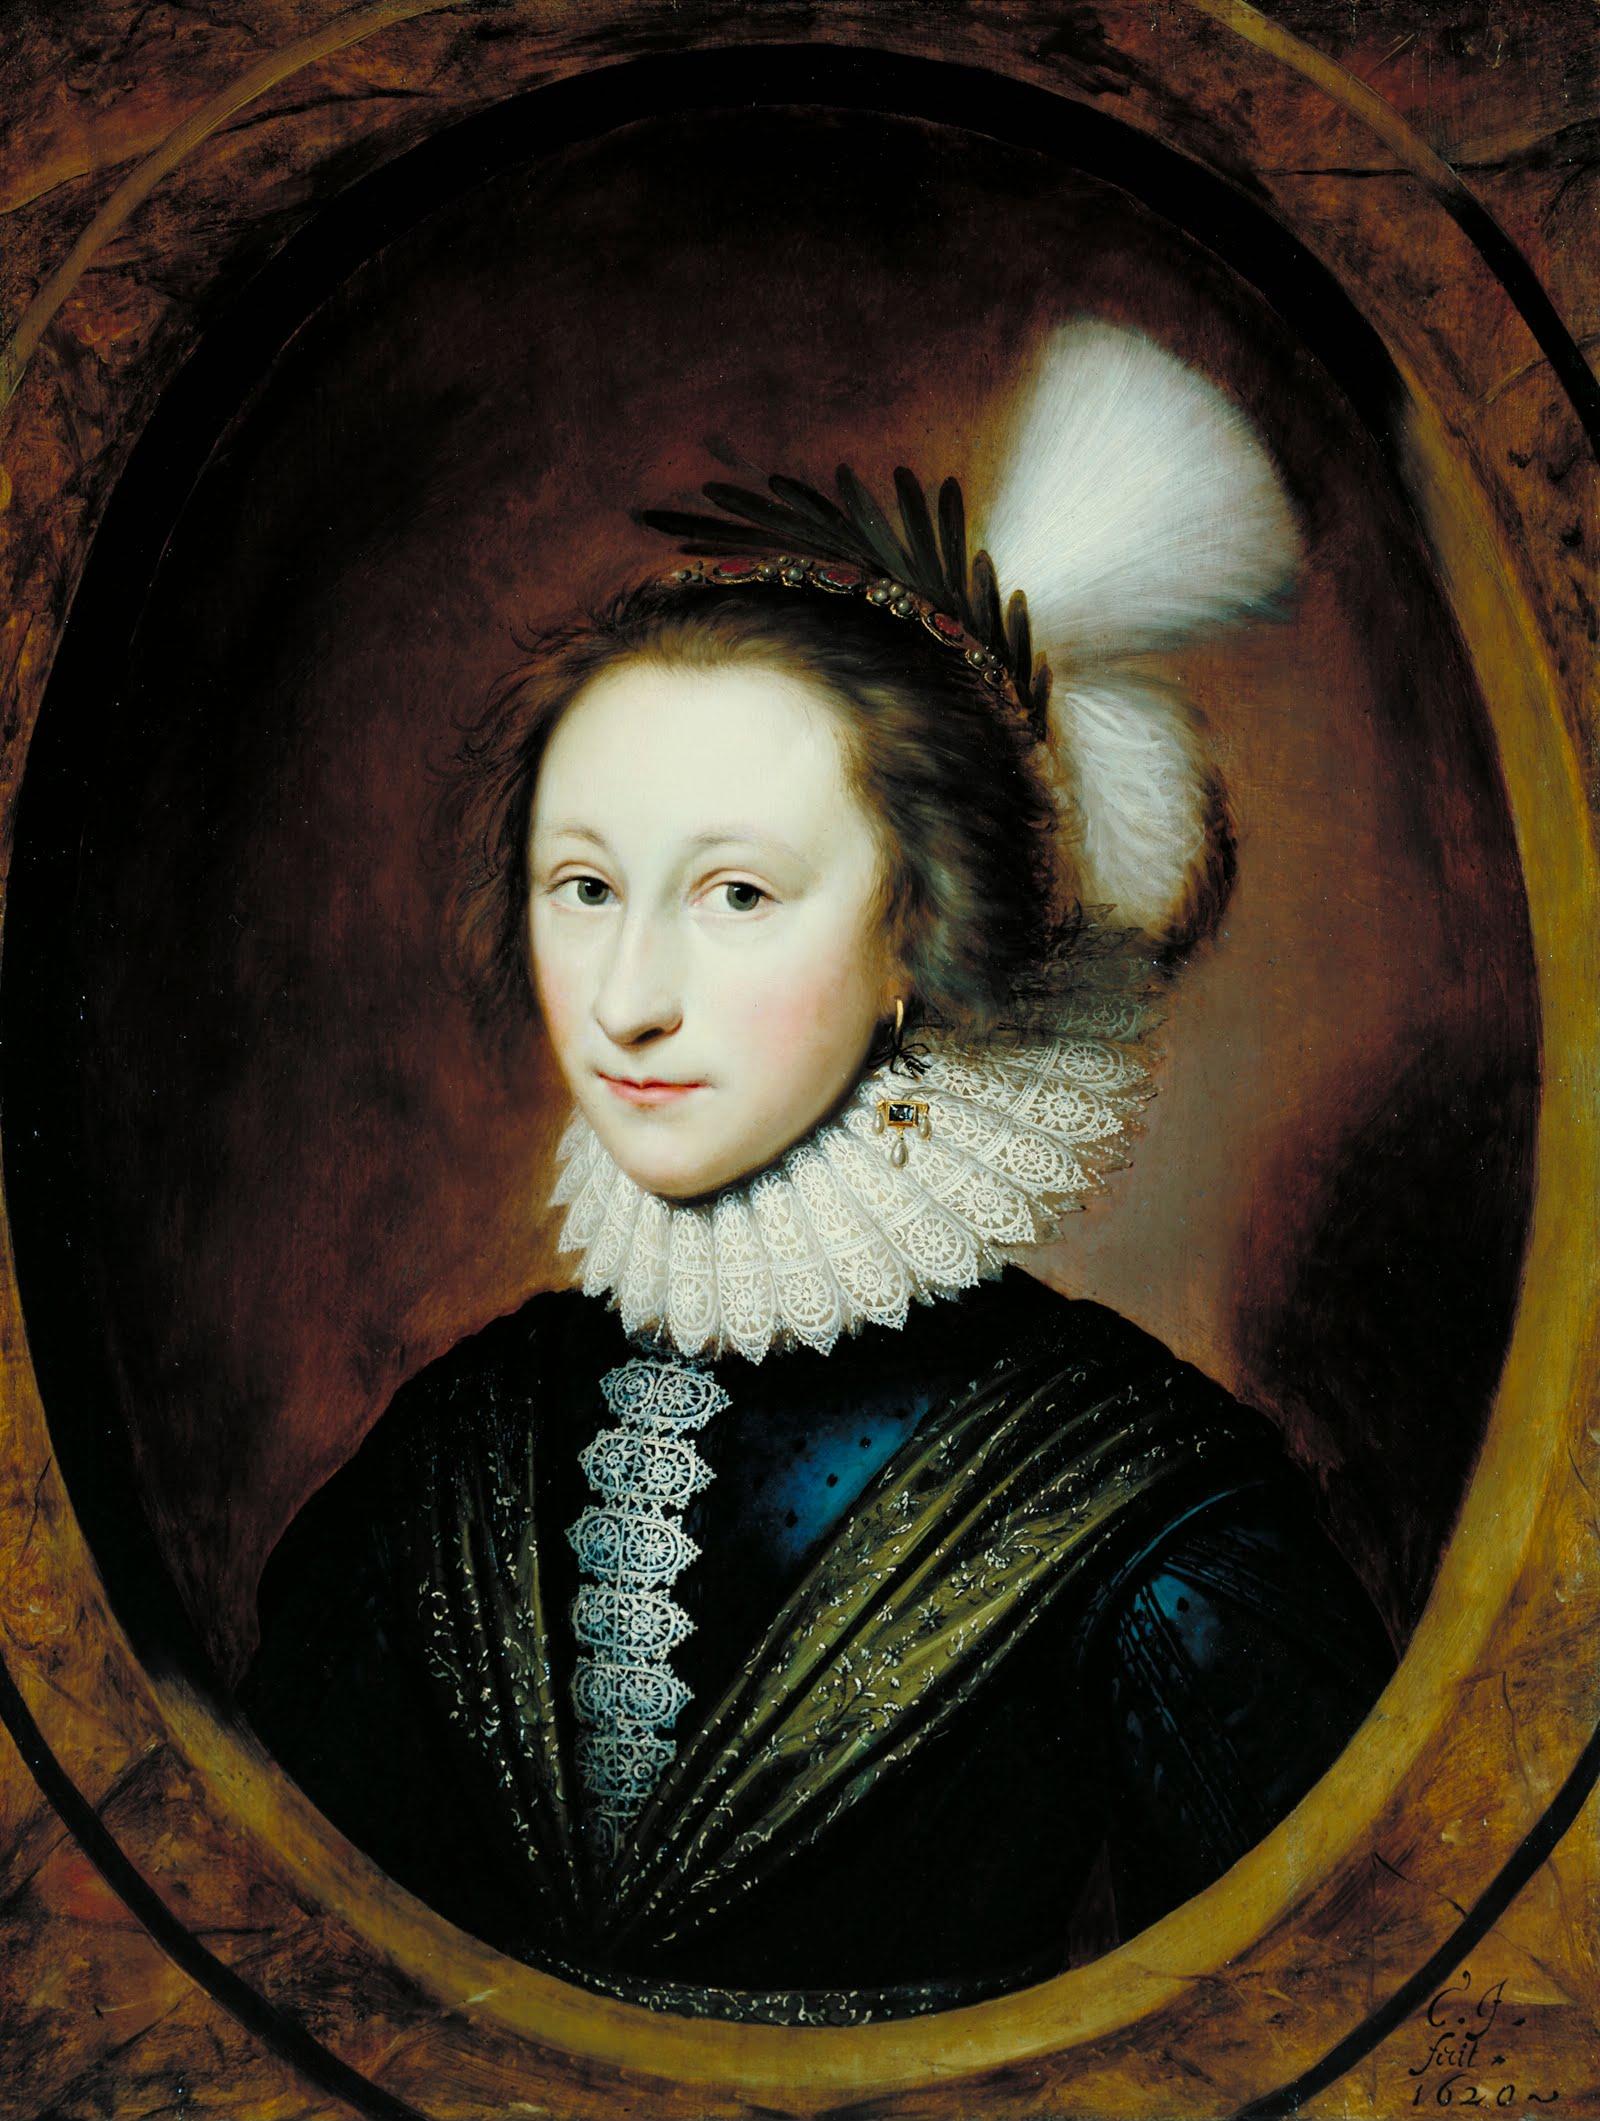 https://upload.wikimedia.org/wikipedia/commons/9/94/Cornelius_Johnson_-_Portrait_of_Susanna_Temple%2C_Later_Lady_Lister_-_Google_Art_Project.jpg